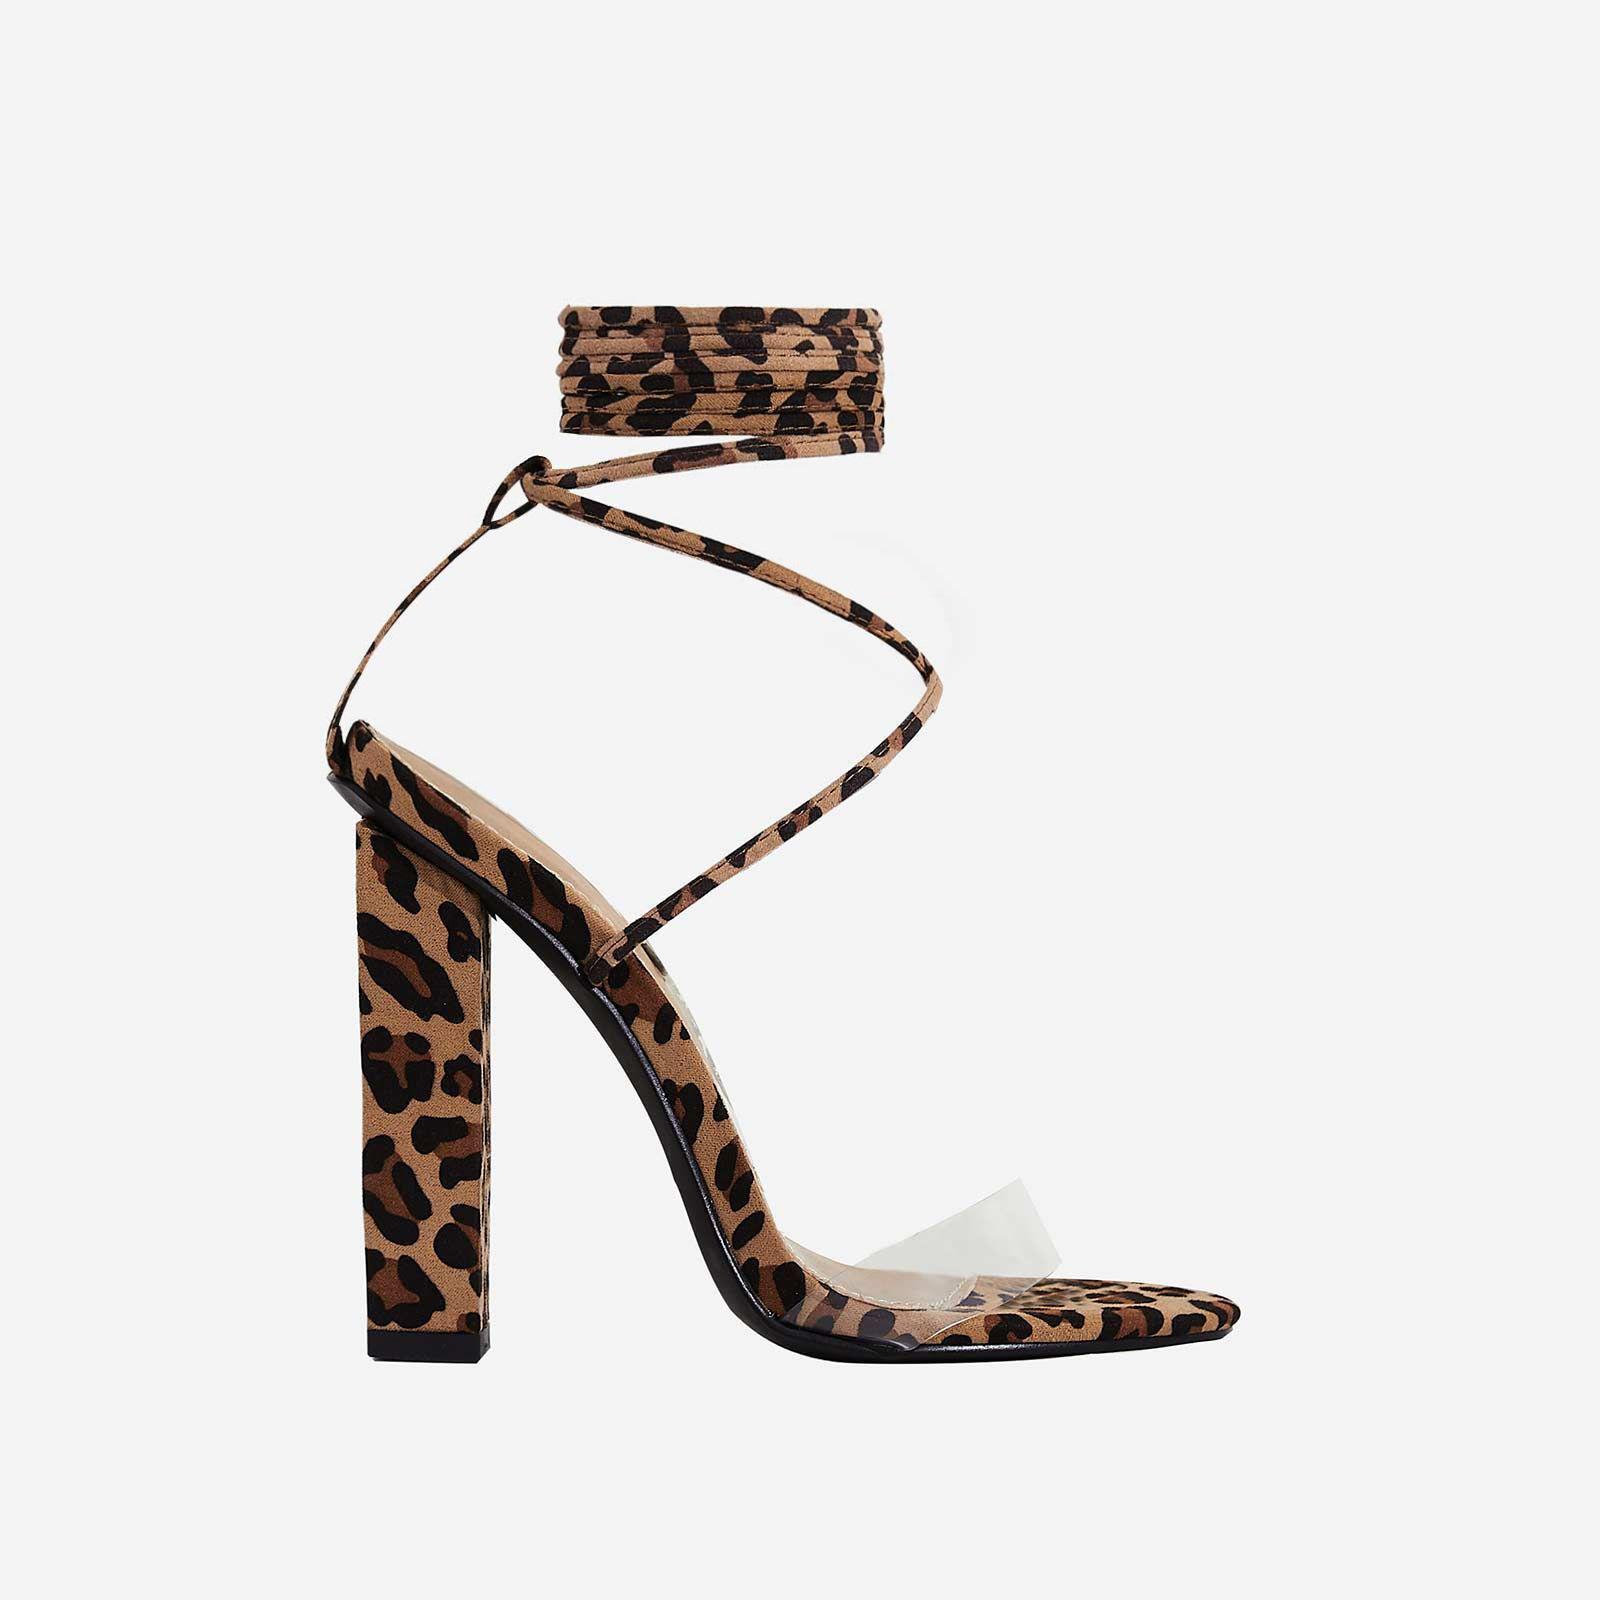 Bello Perspex Lace Up Block Heel In Tan Leopard Print Faux Suede